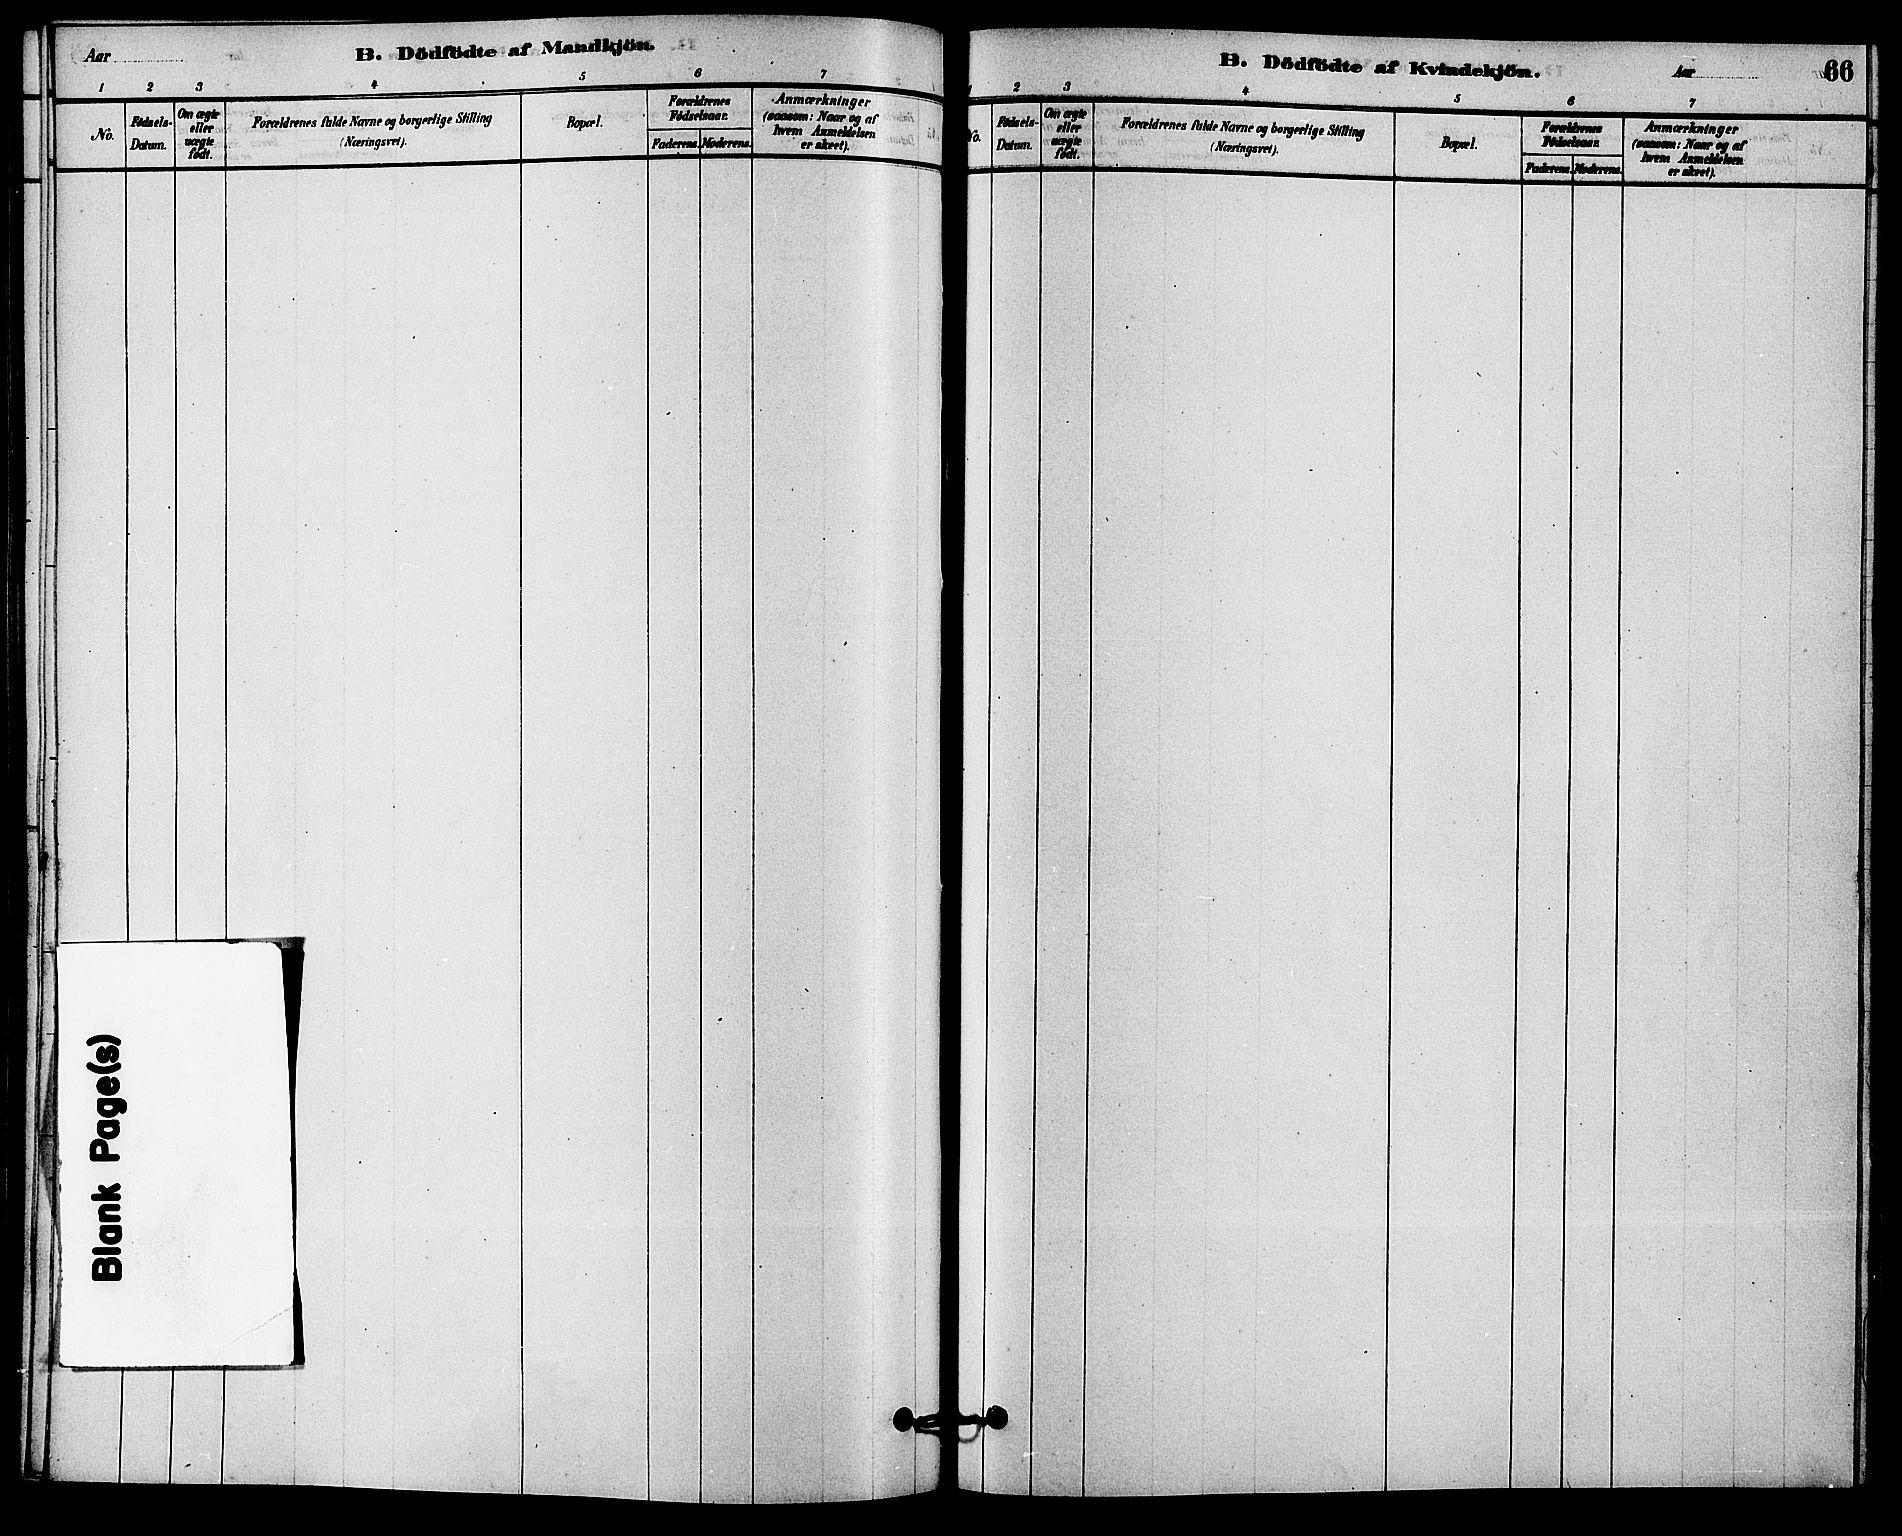 SAKO, Solum kirkebøker, F/Fb/L0001: Ministerialbok nr. II 1, 1877-1892, s. 66